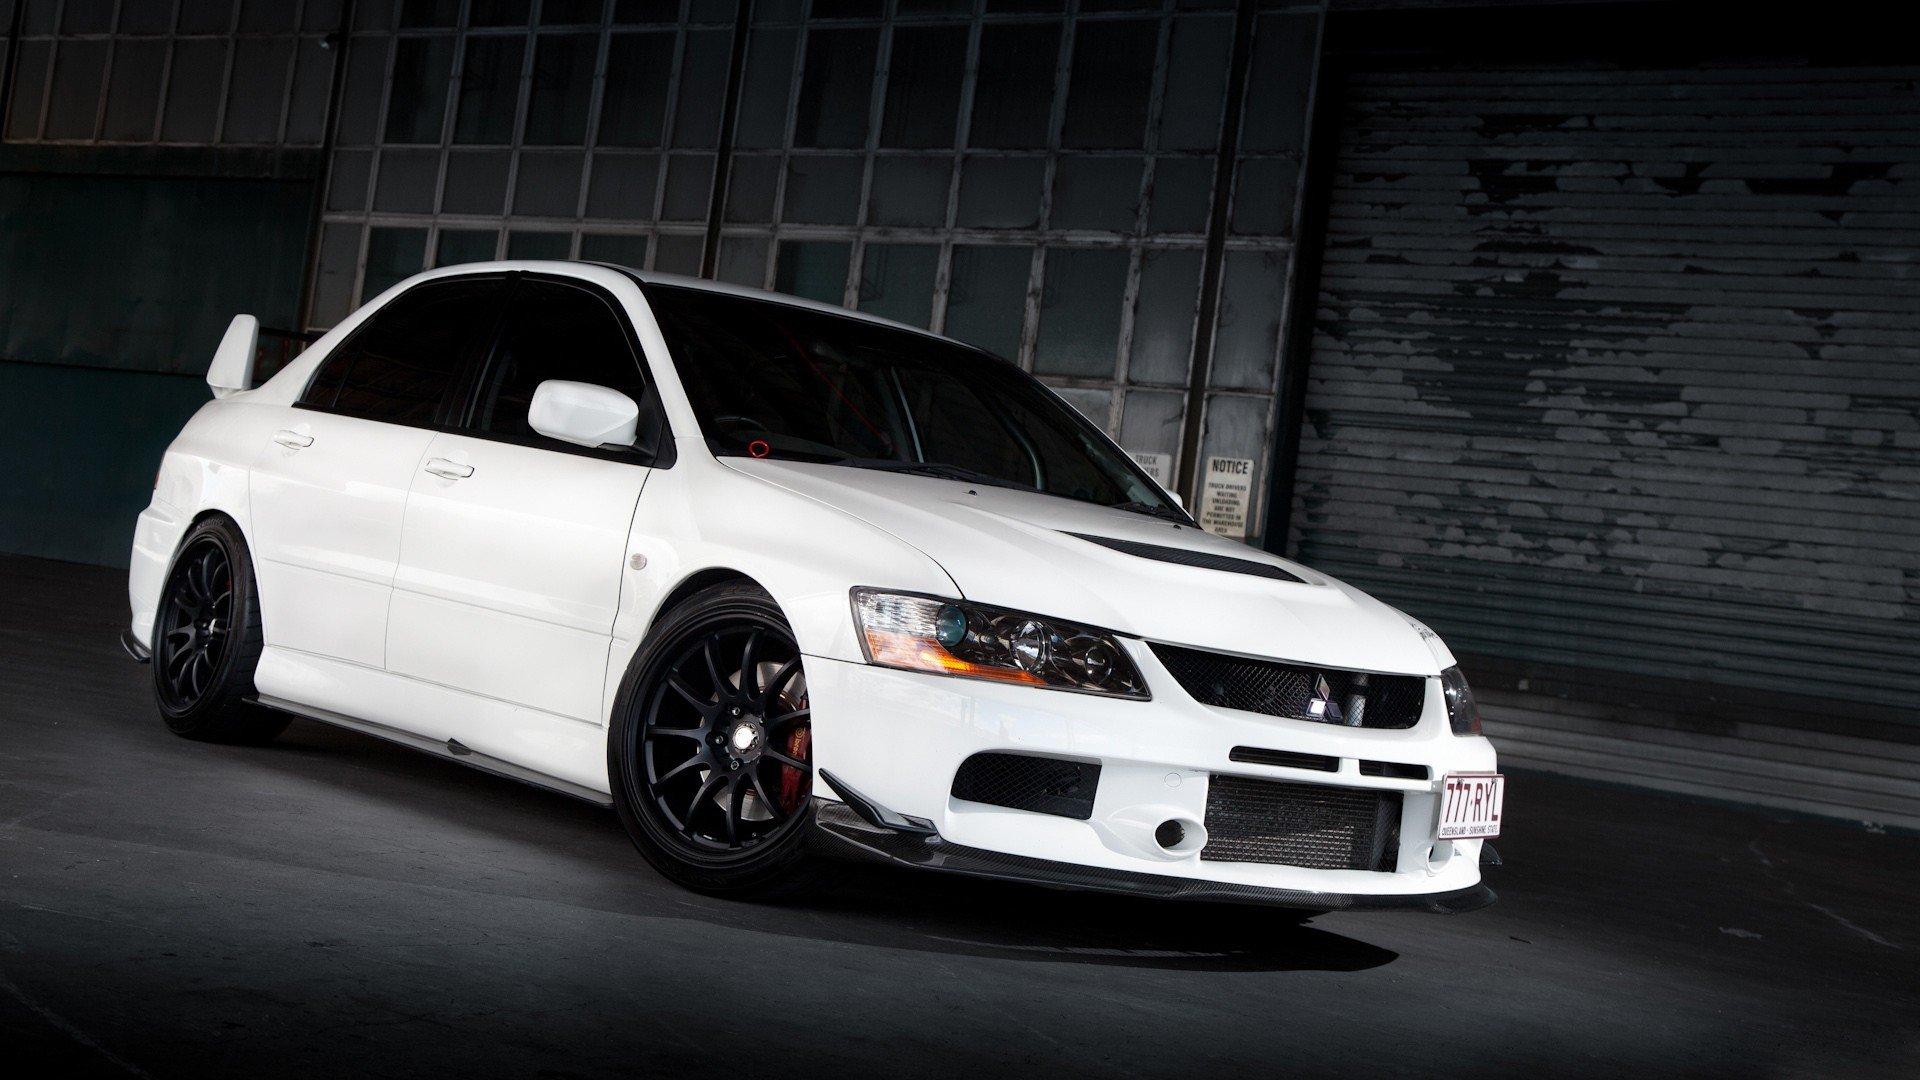 Cars Vehicles Tuning White Cars Mitsubishi Lancer